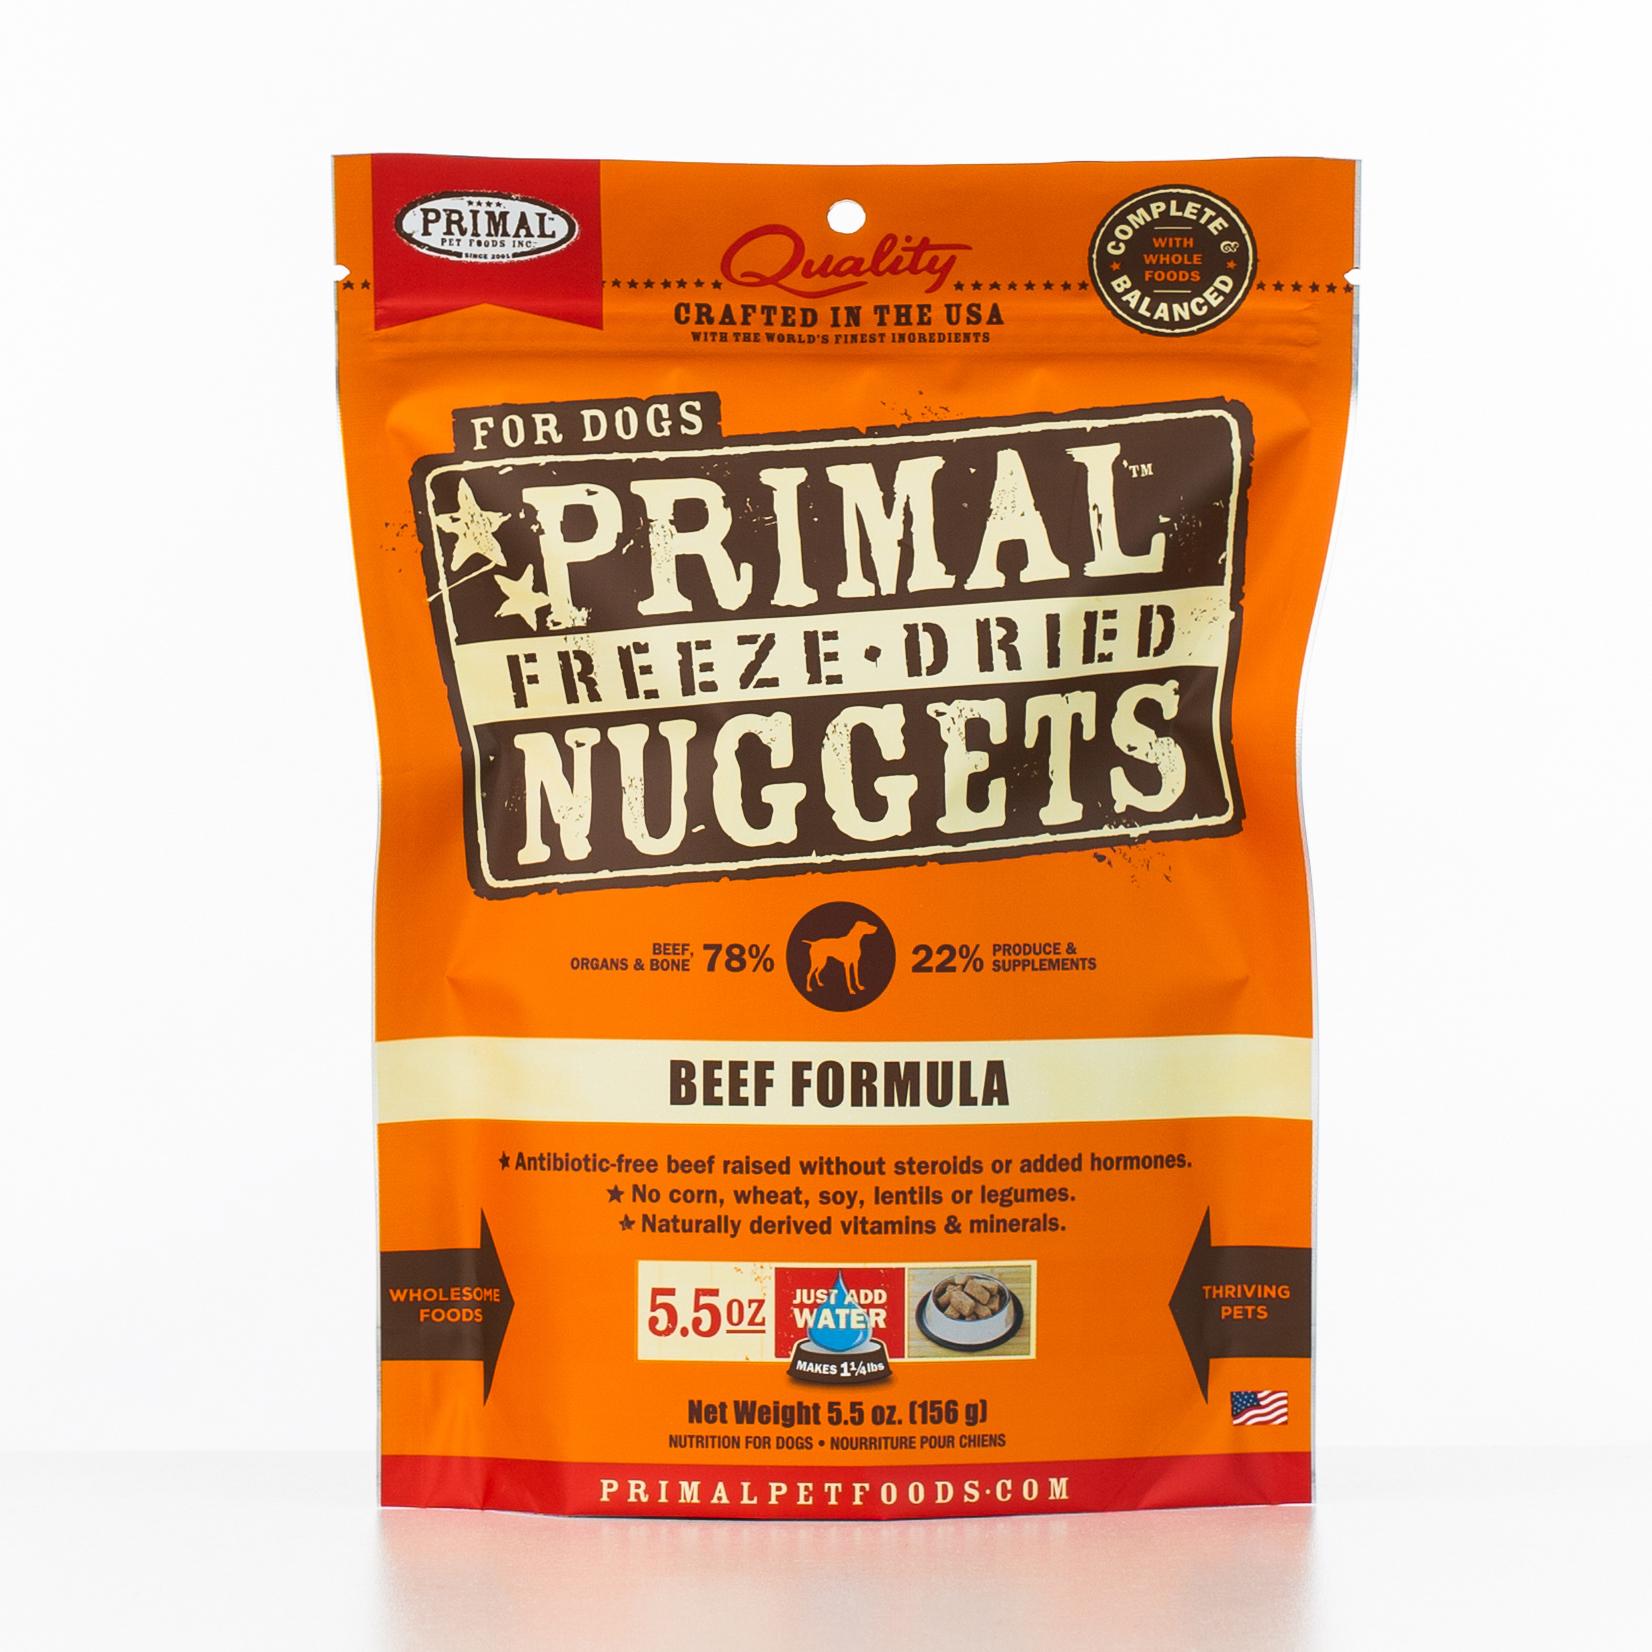 Primal Raw Freeze-Dried Nuggets Beef Formula Dog Food Image